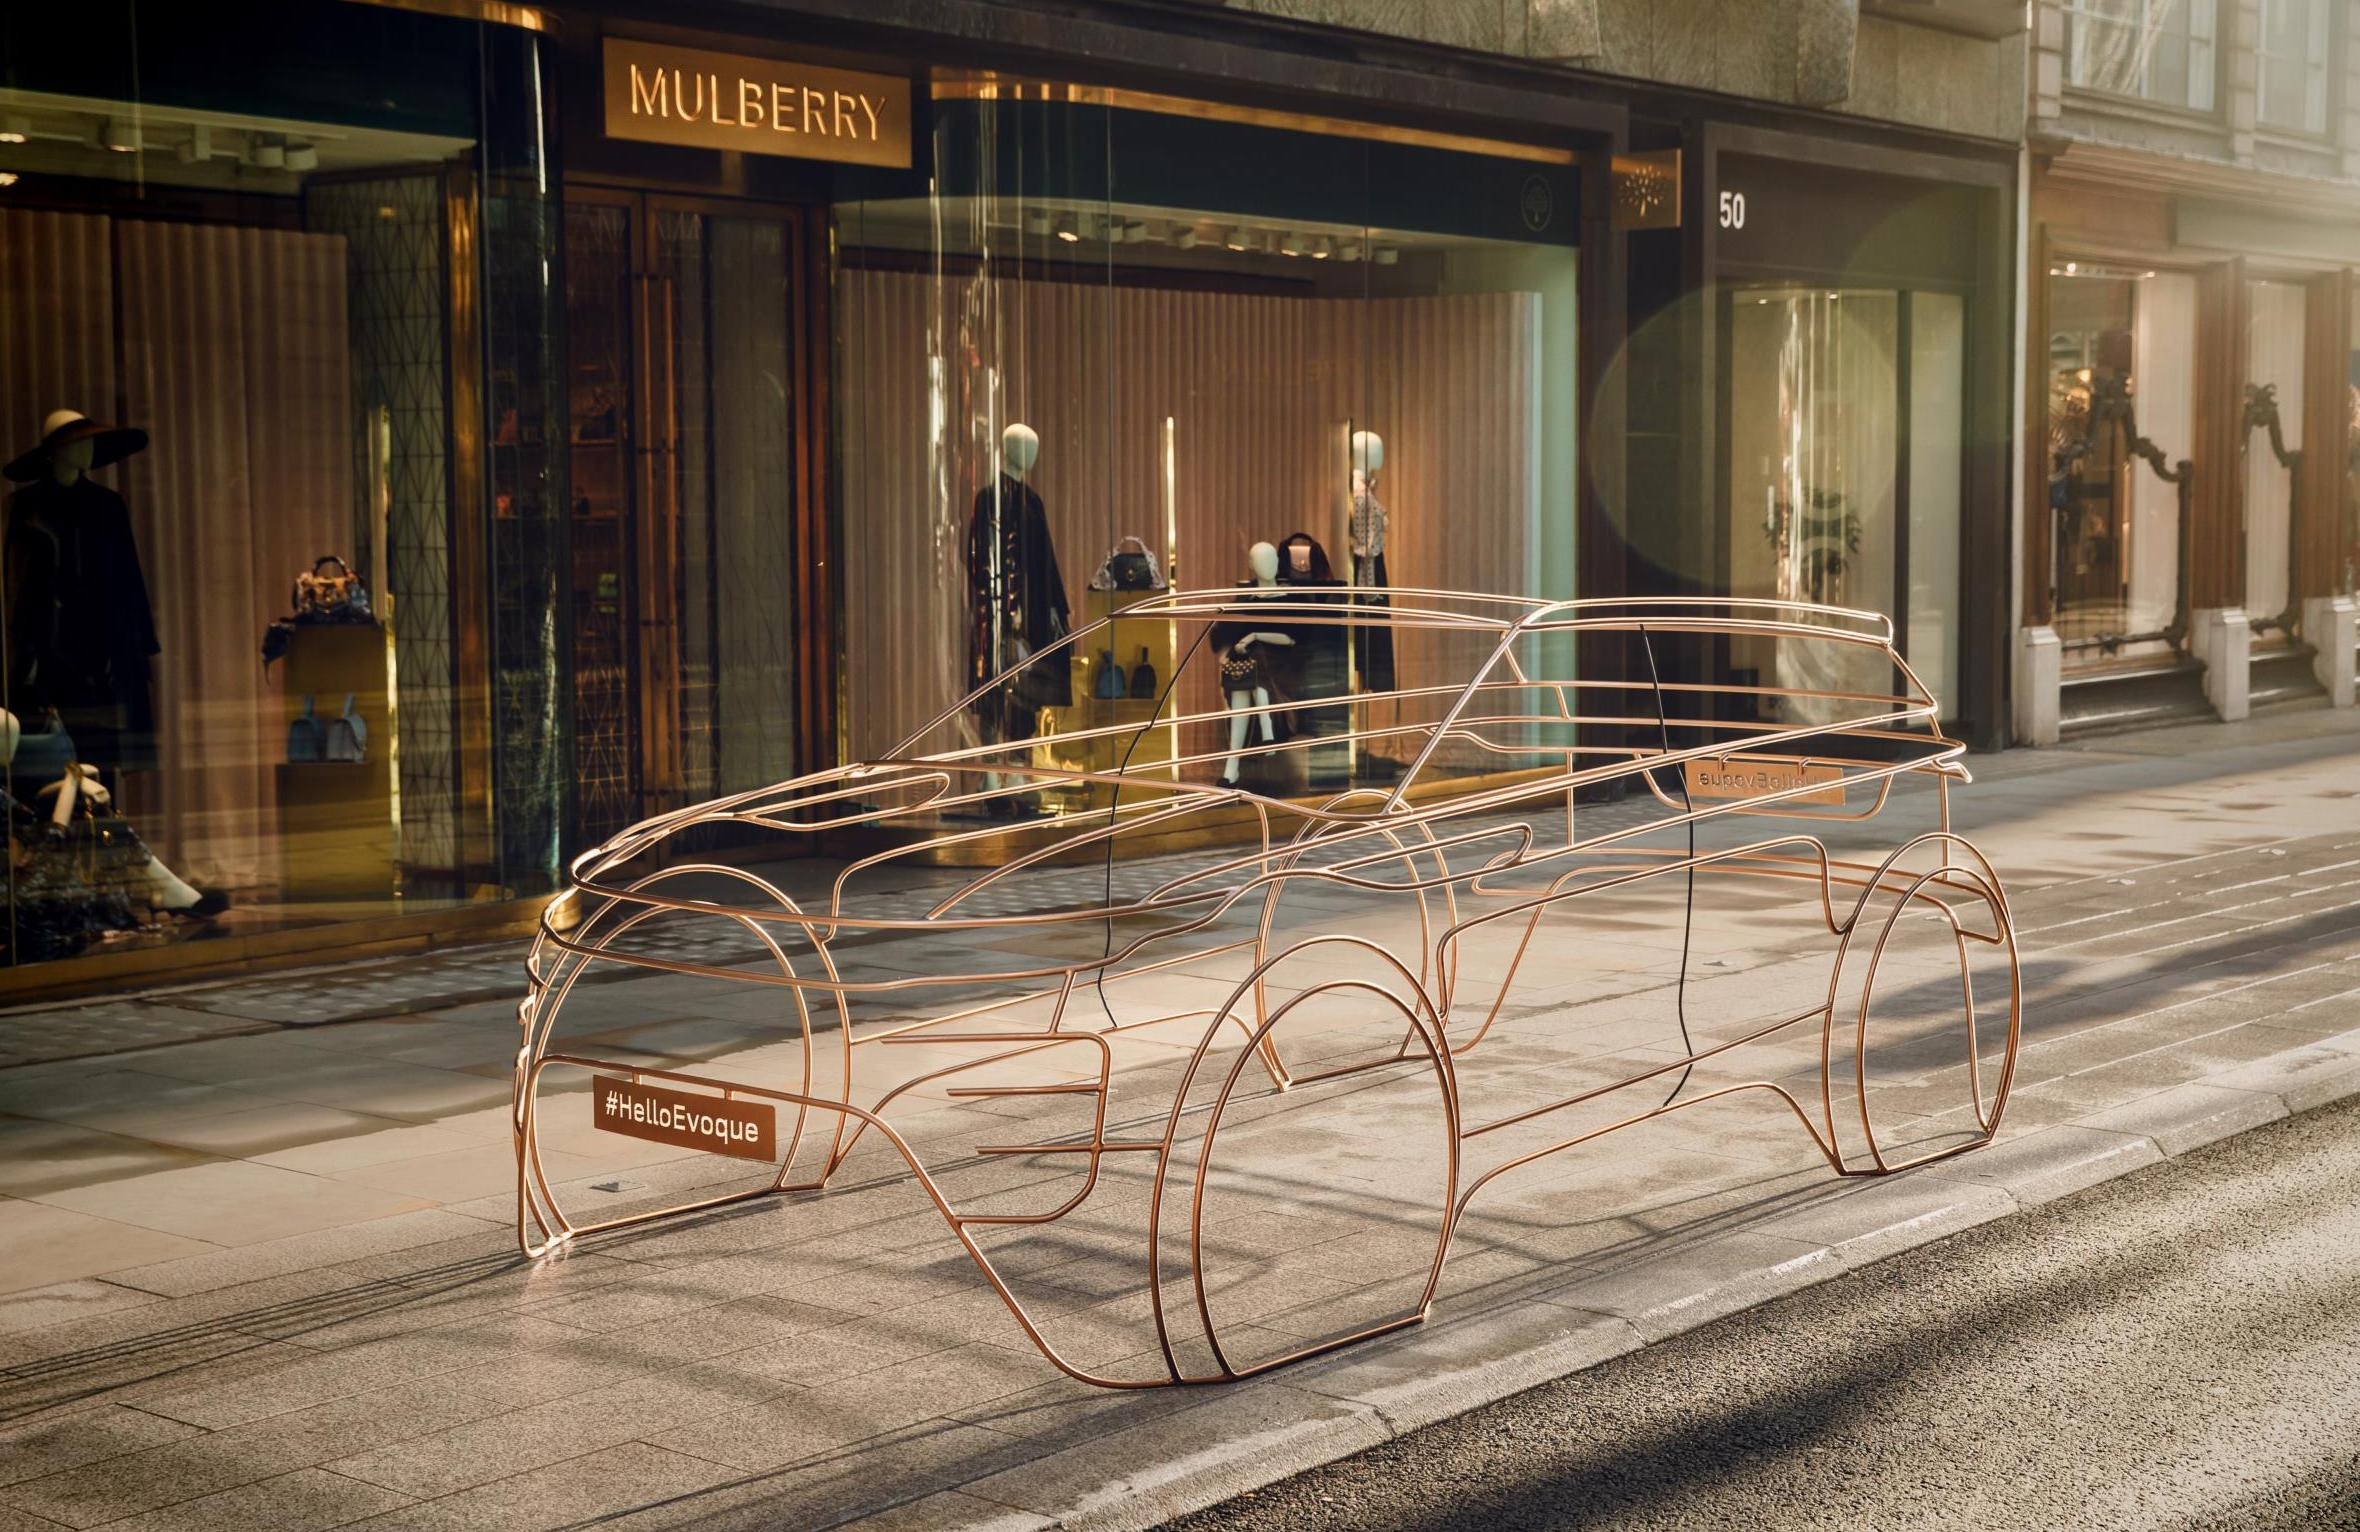 Range Rover Evoque Teased As Wire Sculpture